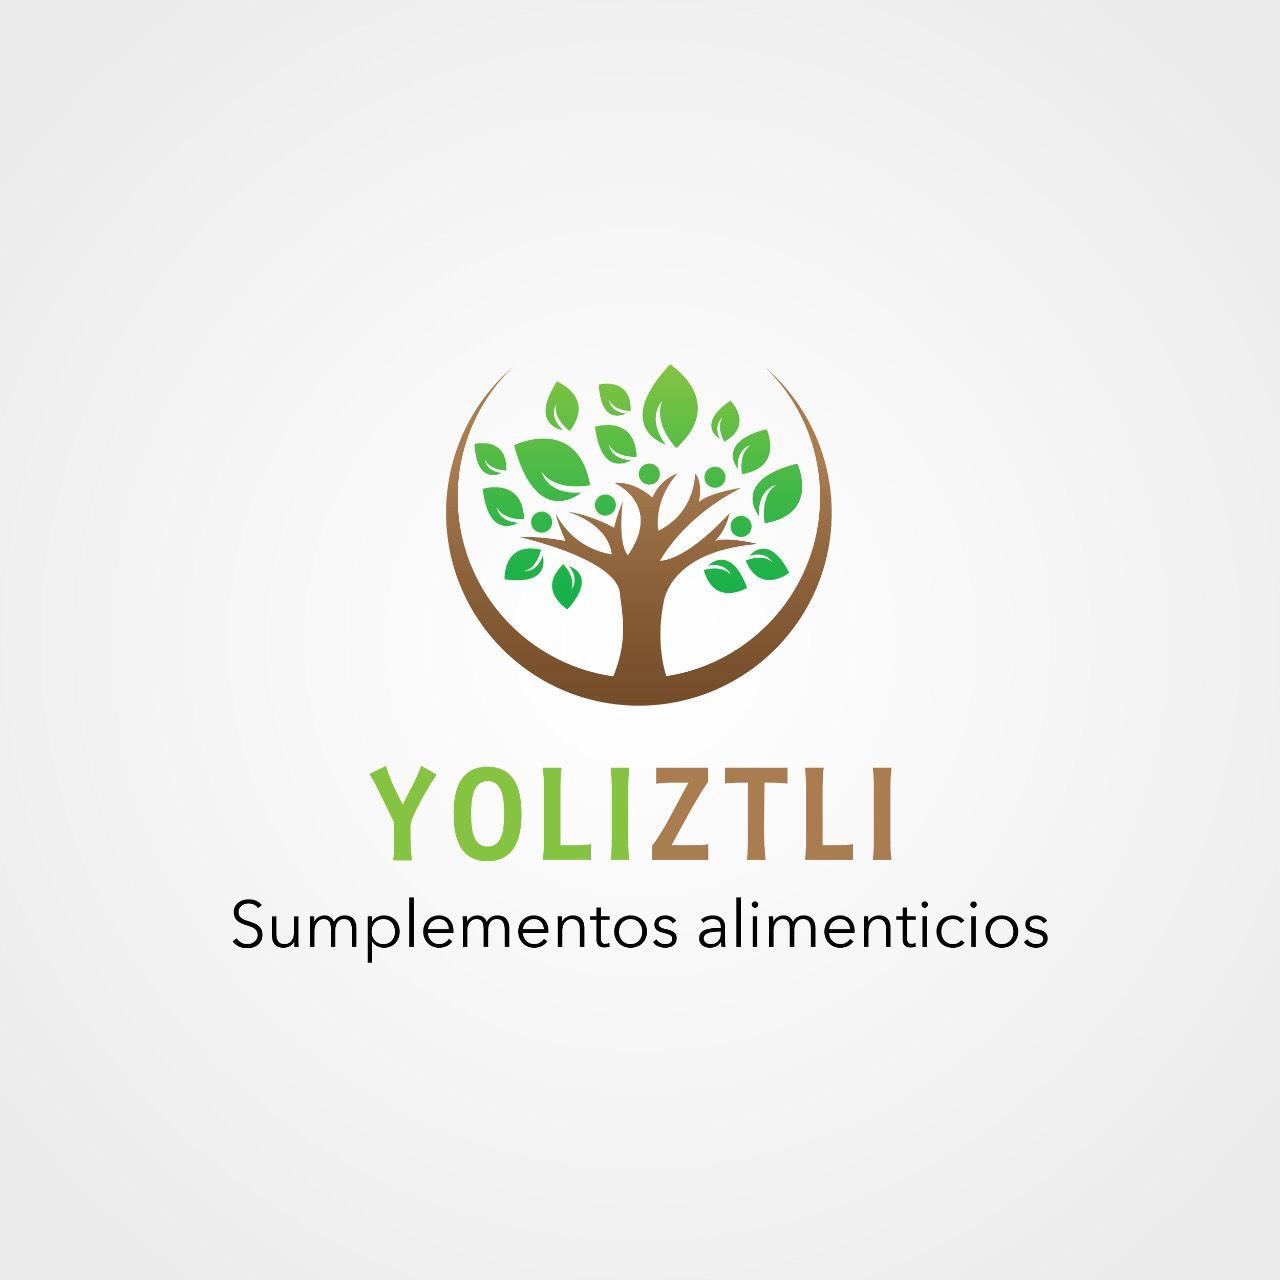 Yoliztli, Salud natural